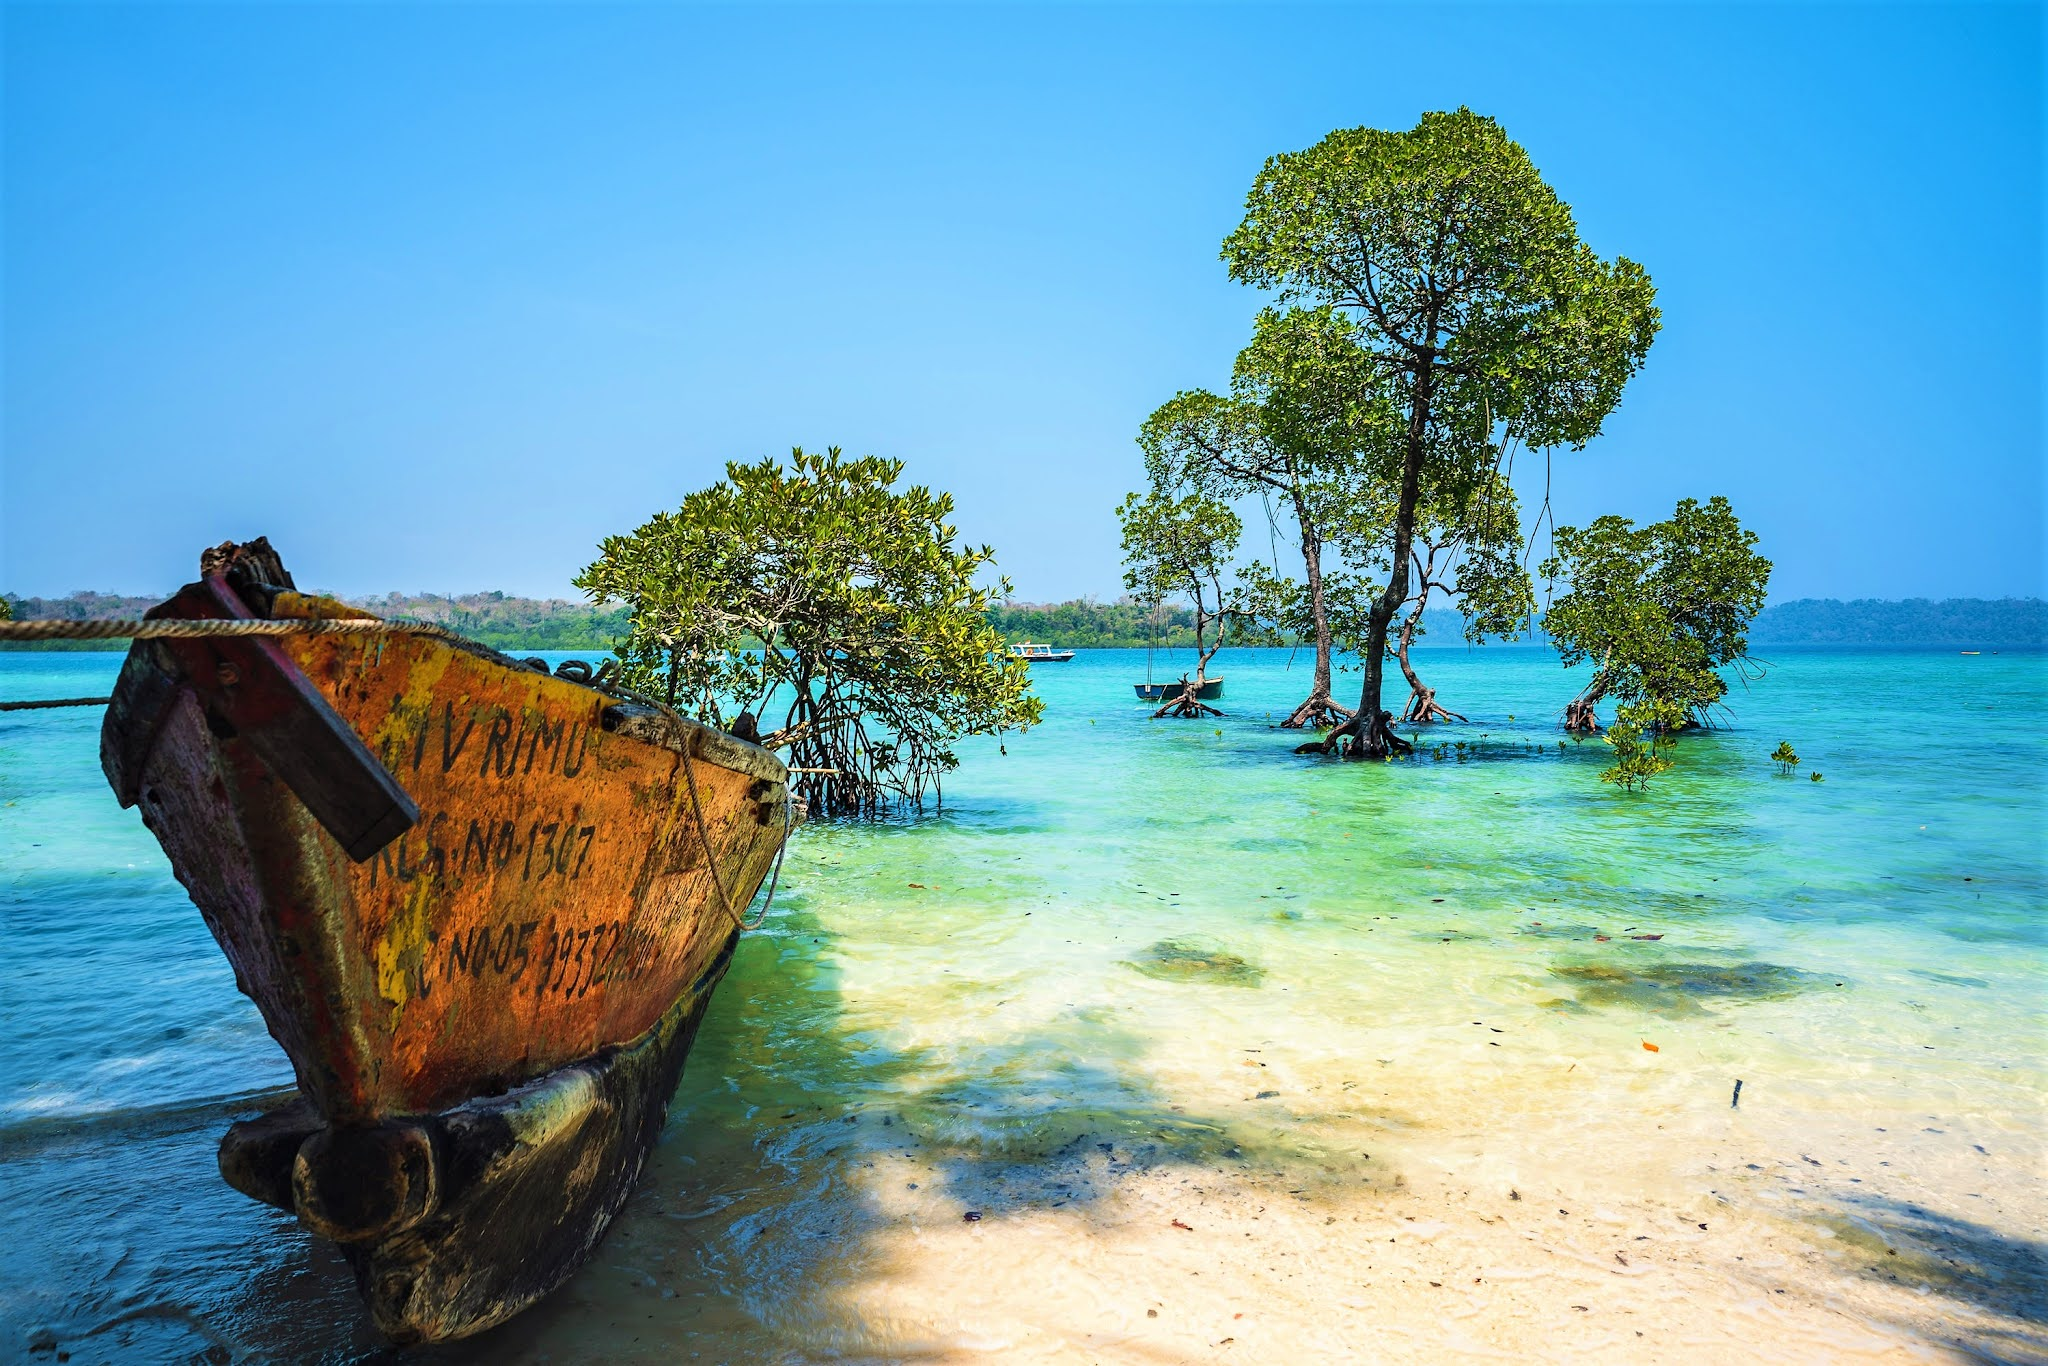 ANDAMAN ISLANDS: THE BARREN ISLANDS